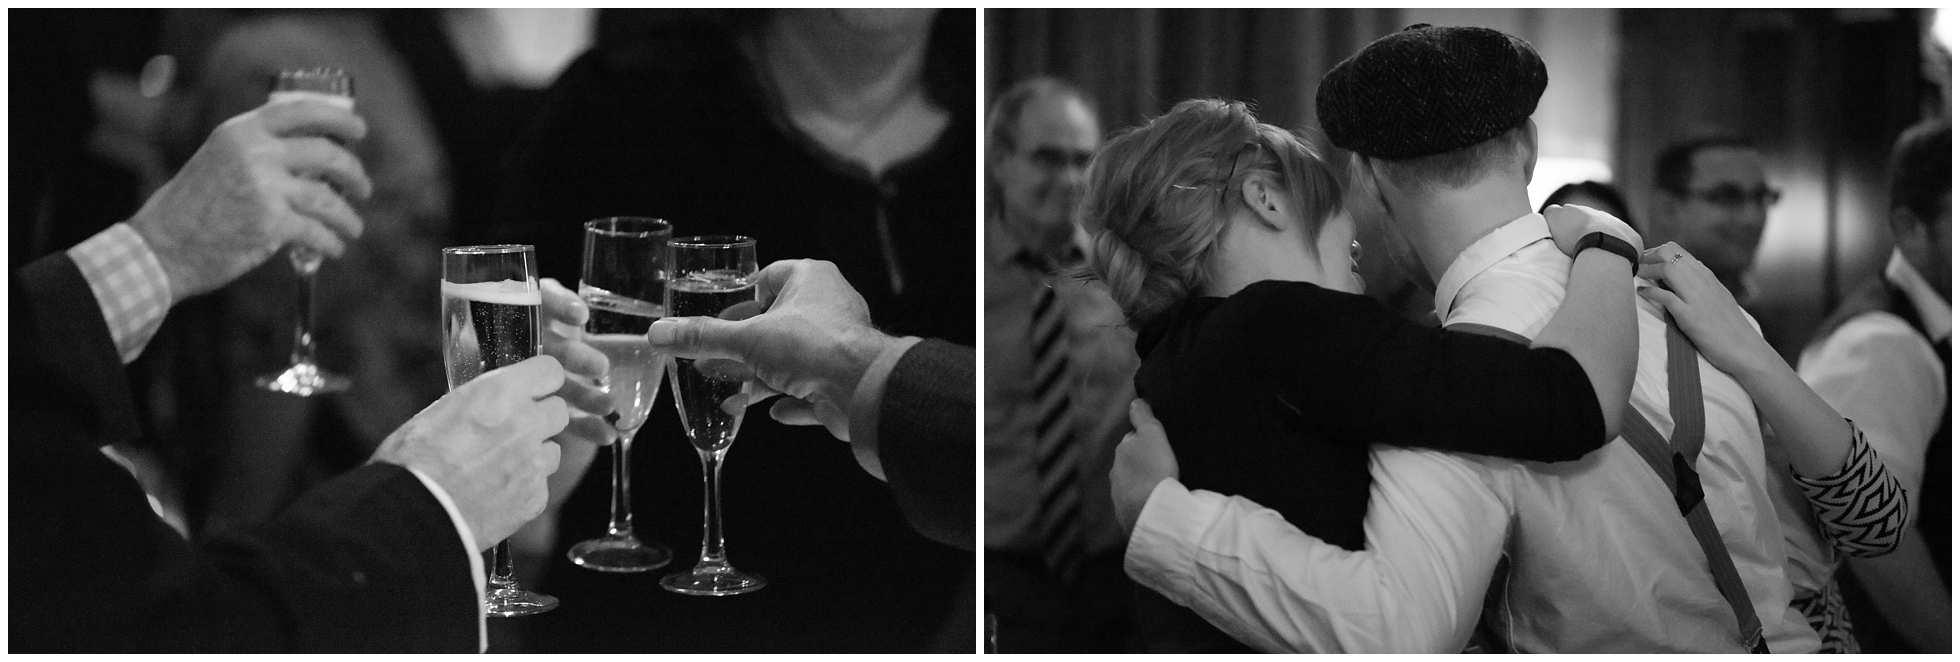 the toasts, the tears london wedding